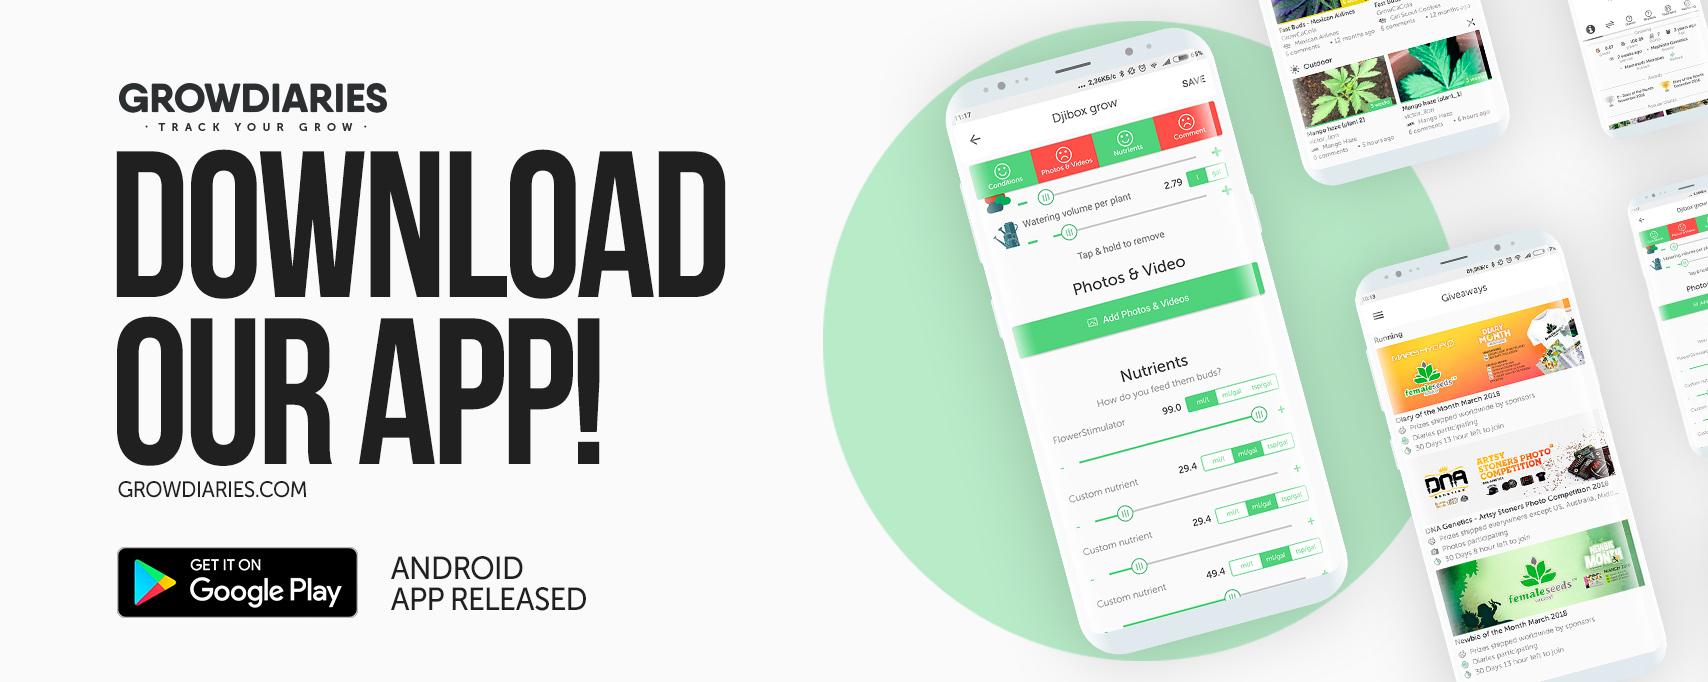 hello status app download